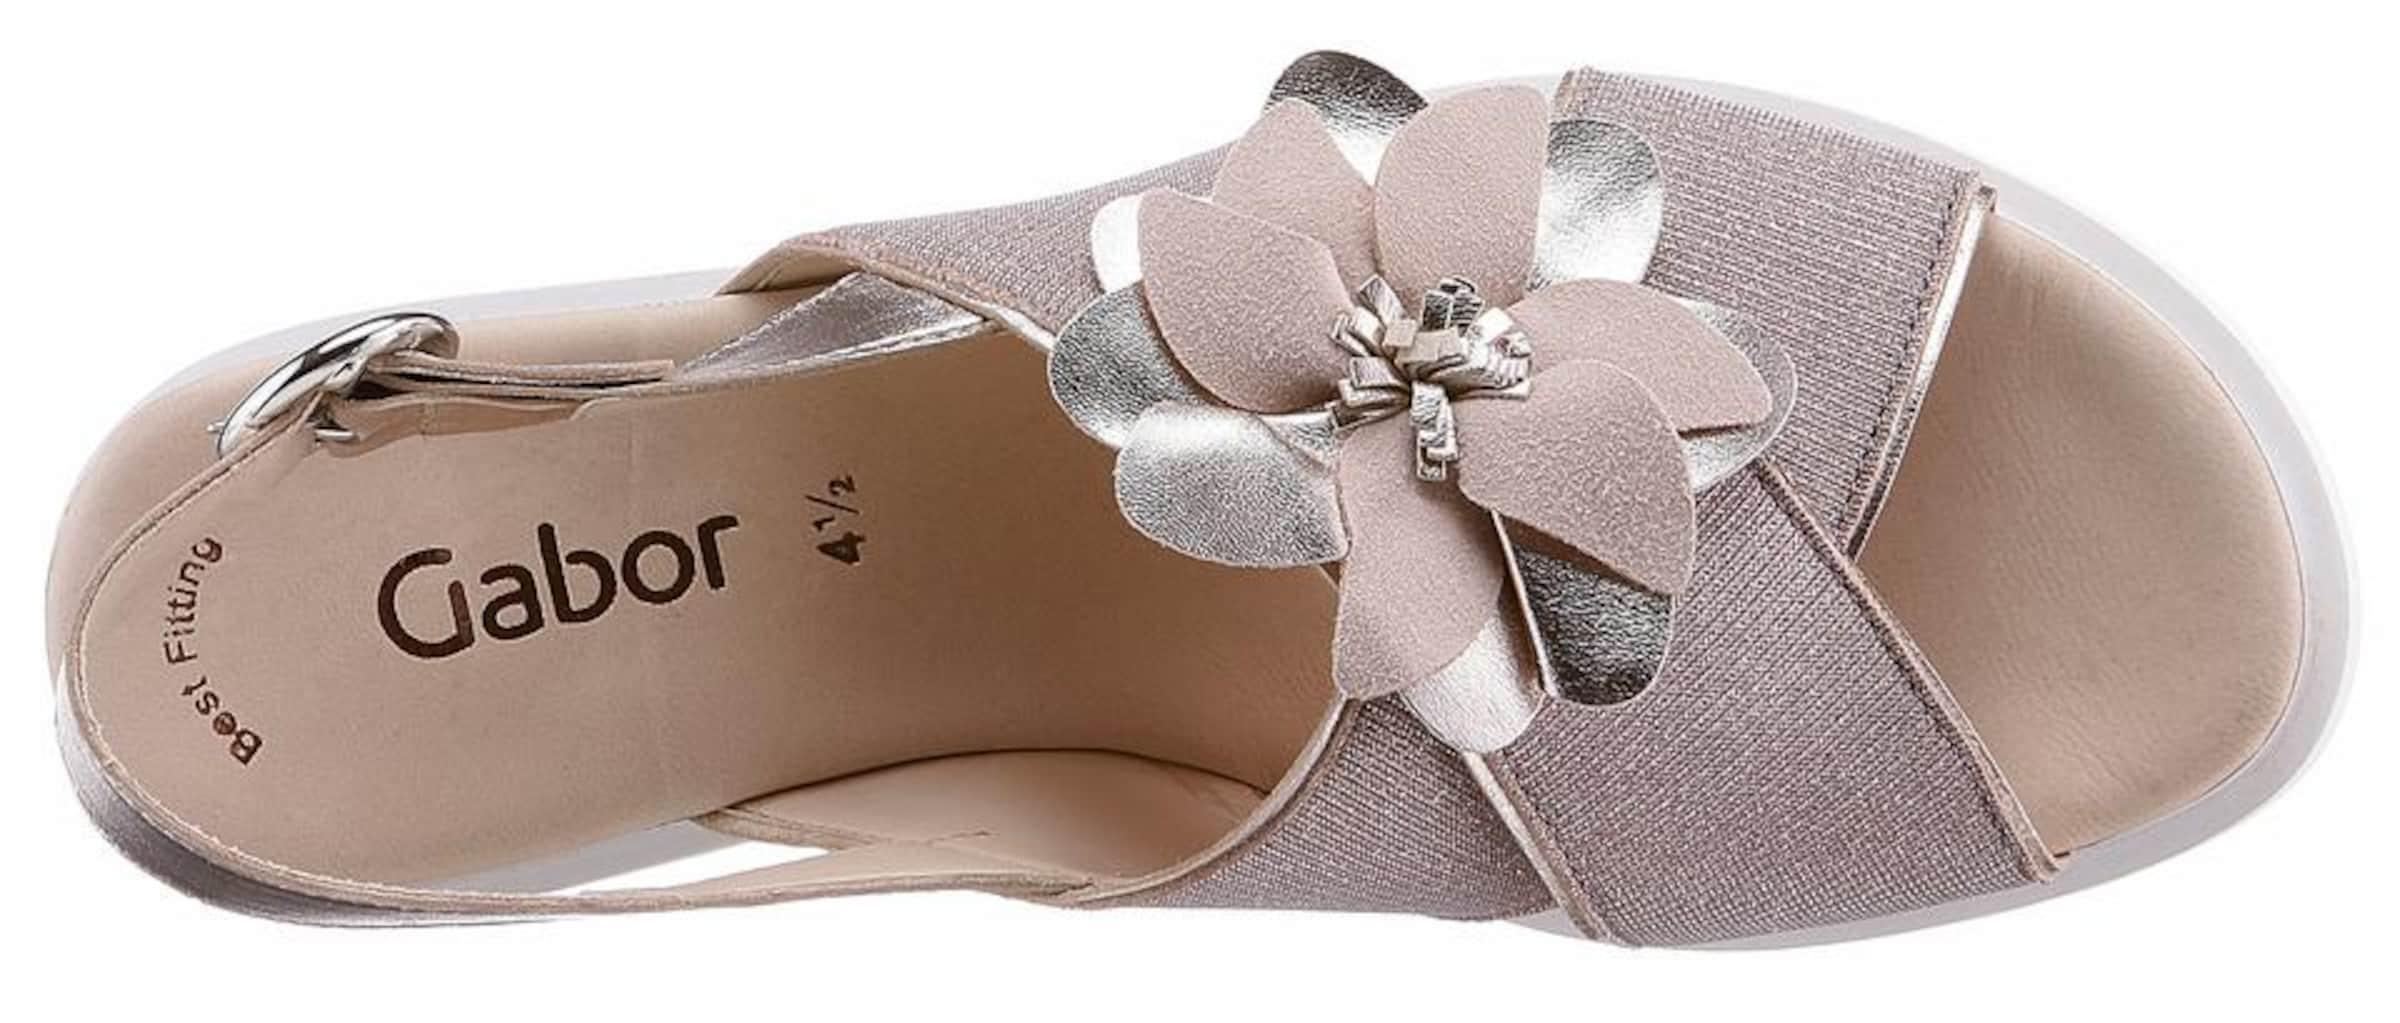 Sandalette In Silber Gabor CremeRosegold Weiß byf76Ygv